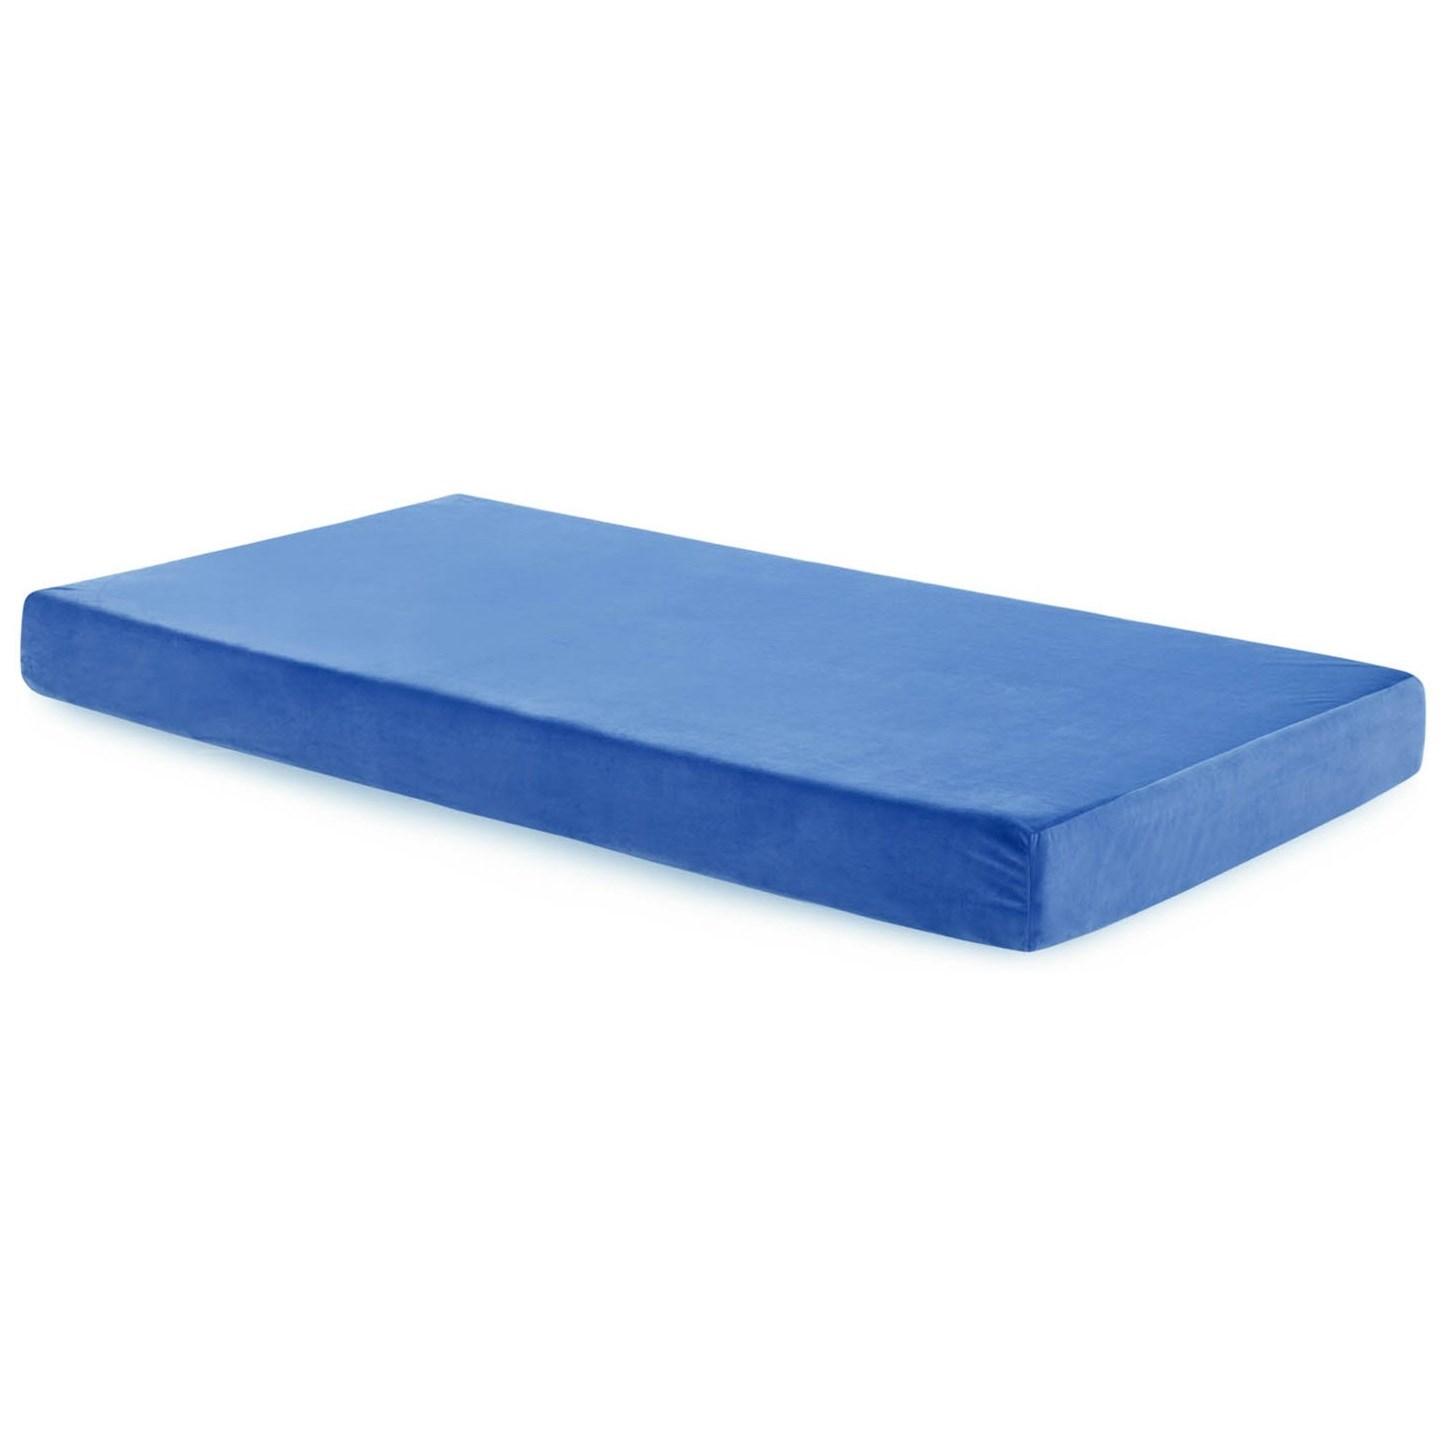 malouf brighton bb06tt30gf bl twin youth gel memory foam mattress nassau furniture mattresses. Black Bedroom Furniture Sets. Home Design Ideas